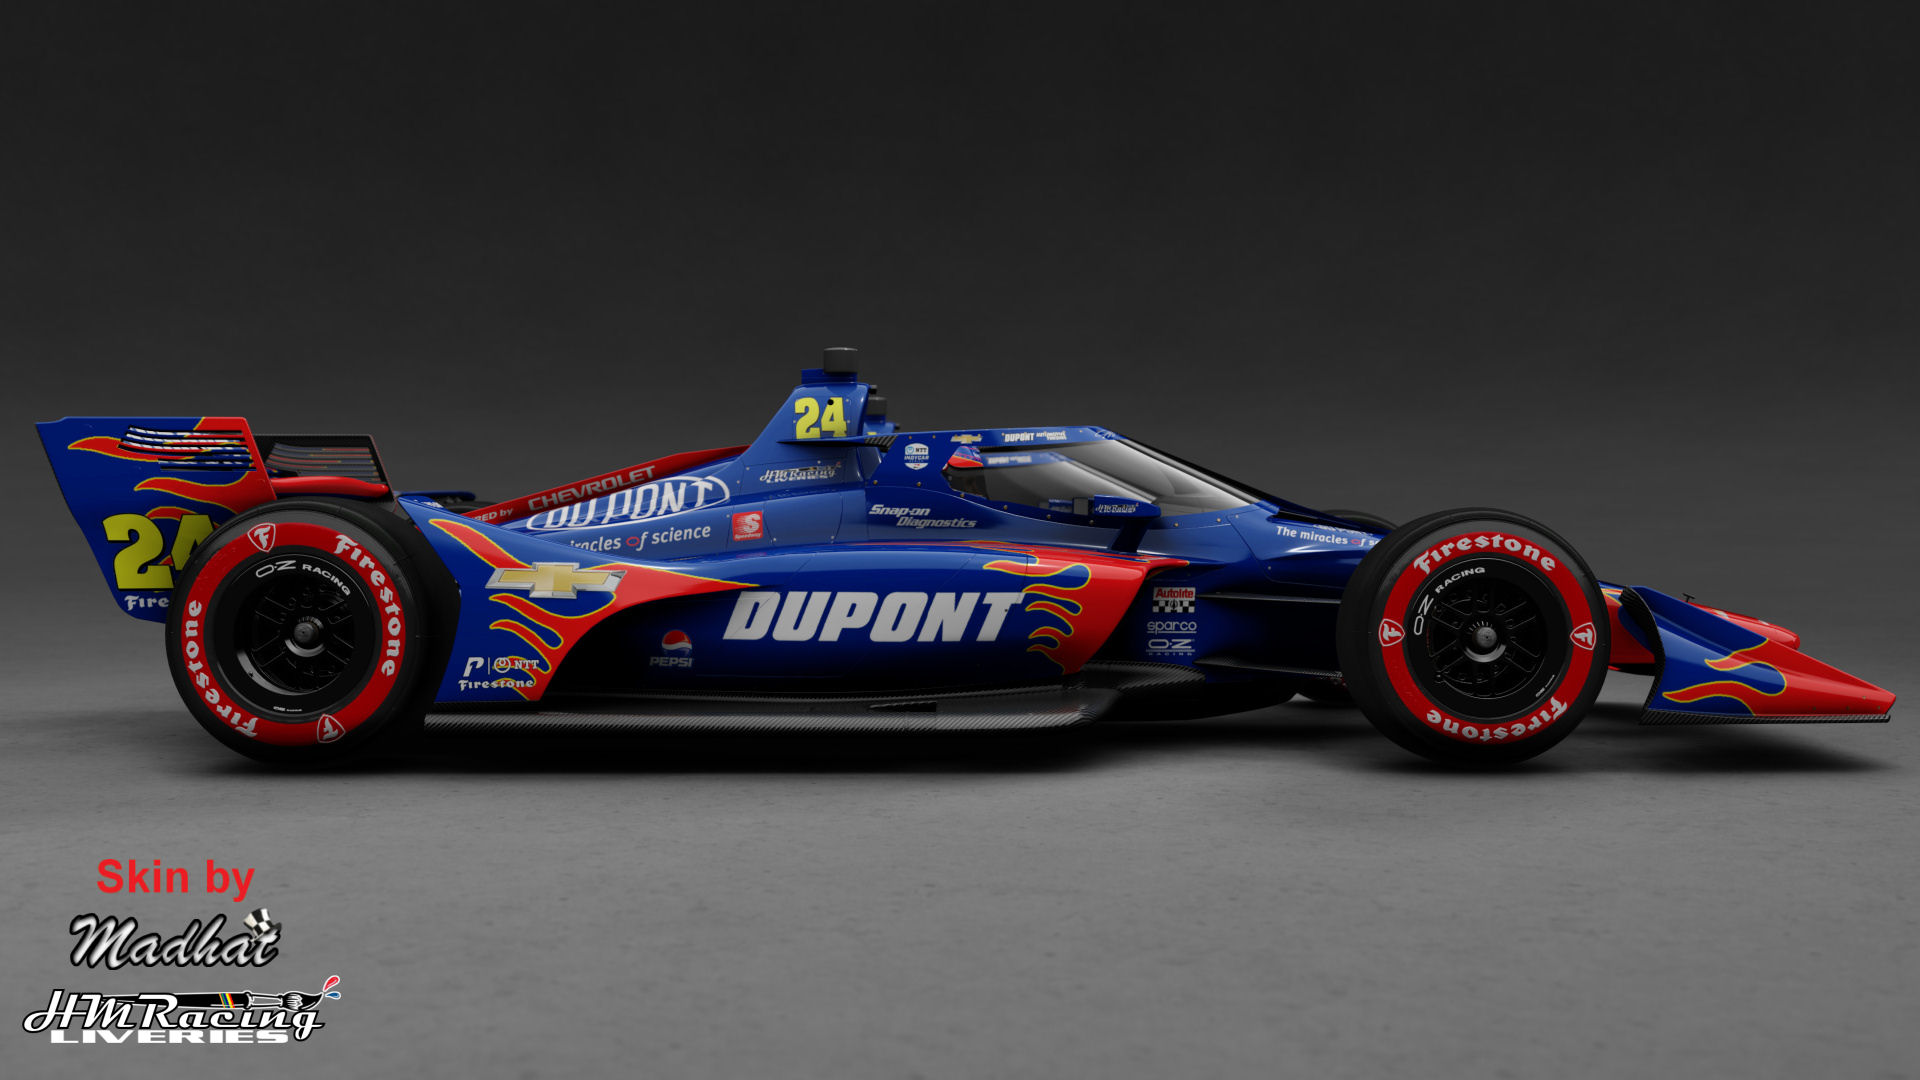 DU PONT Jeff Gordon 24 IndyCar Madhat HMRacing Liveries 02.jpg